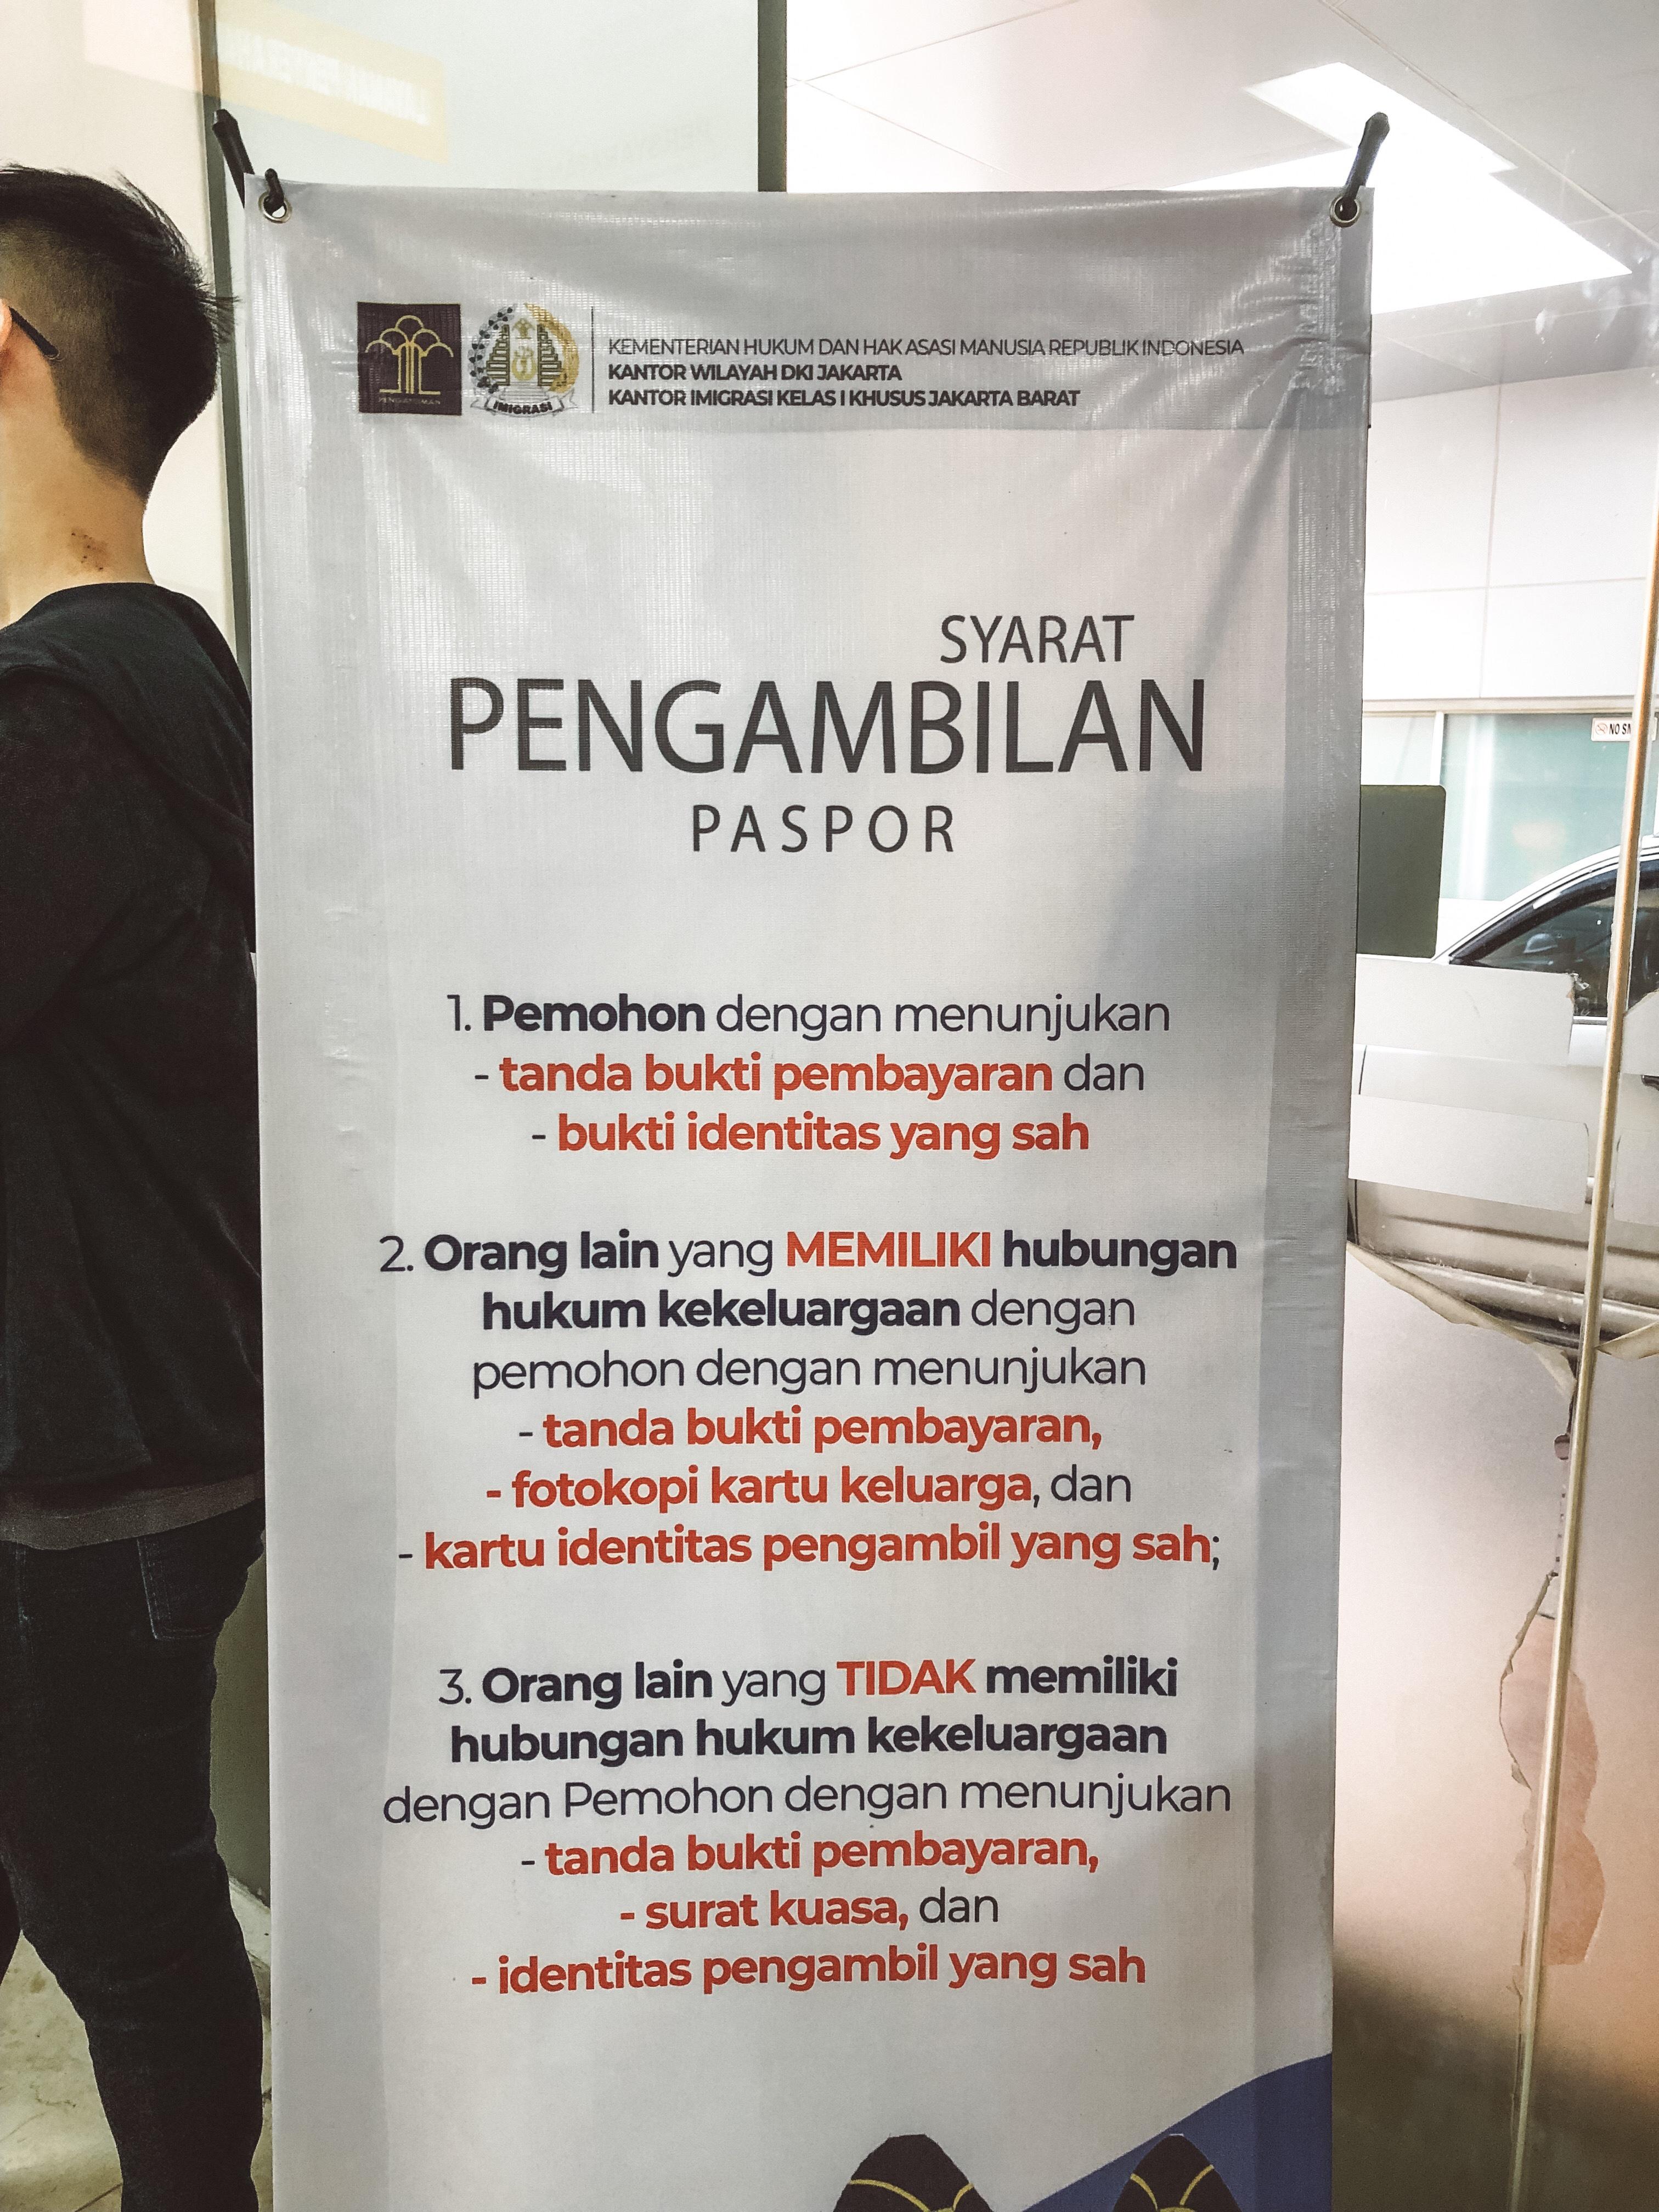 Perpanjang Paspor Online 2019 Jenita Darmento